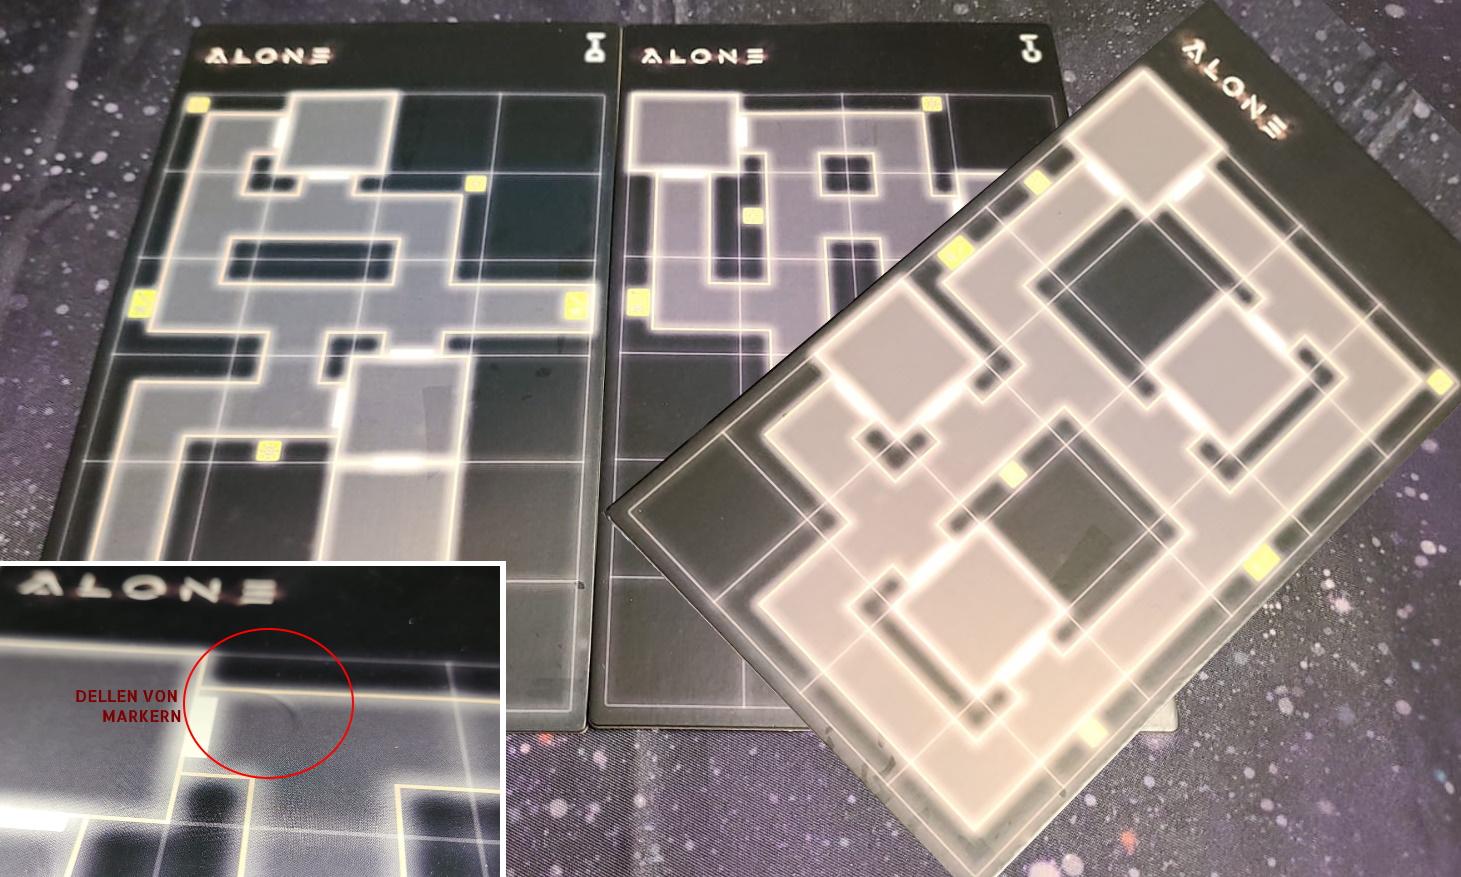 Extra Maps